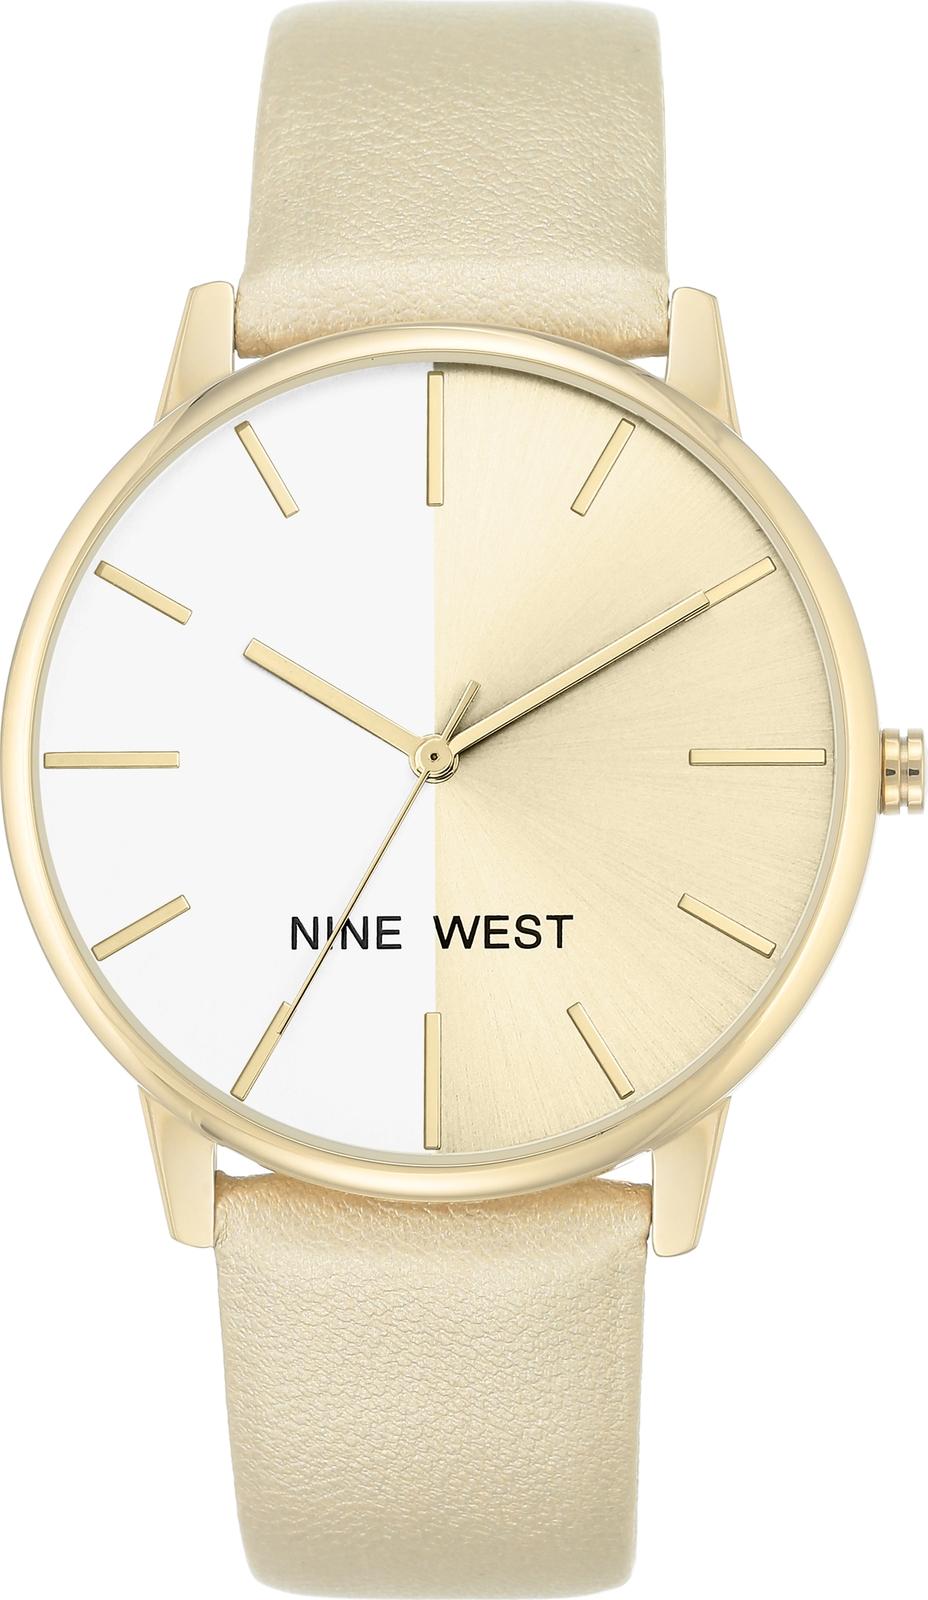 Часы Nine West женские золотой часы nixon time teller deluxe leather navy sunray brow